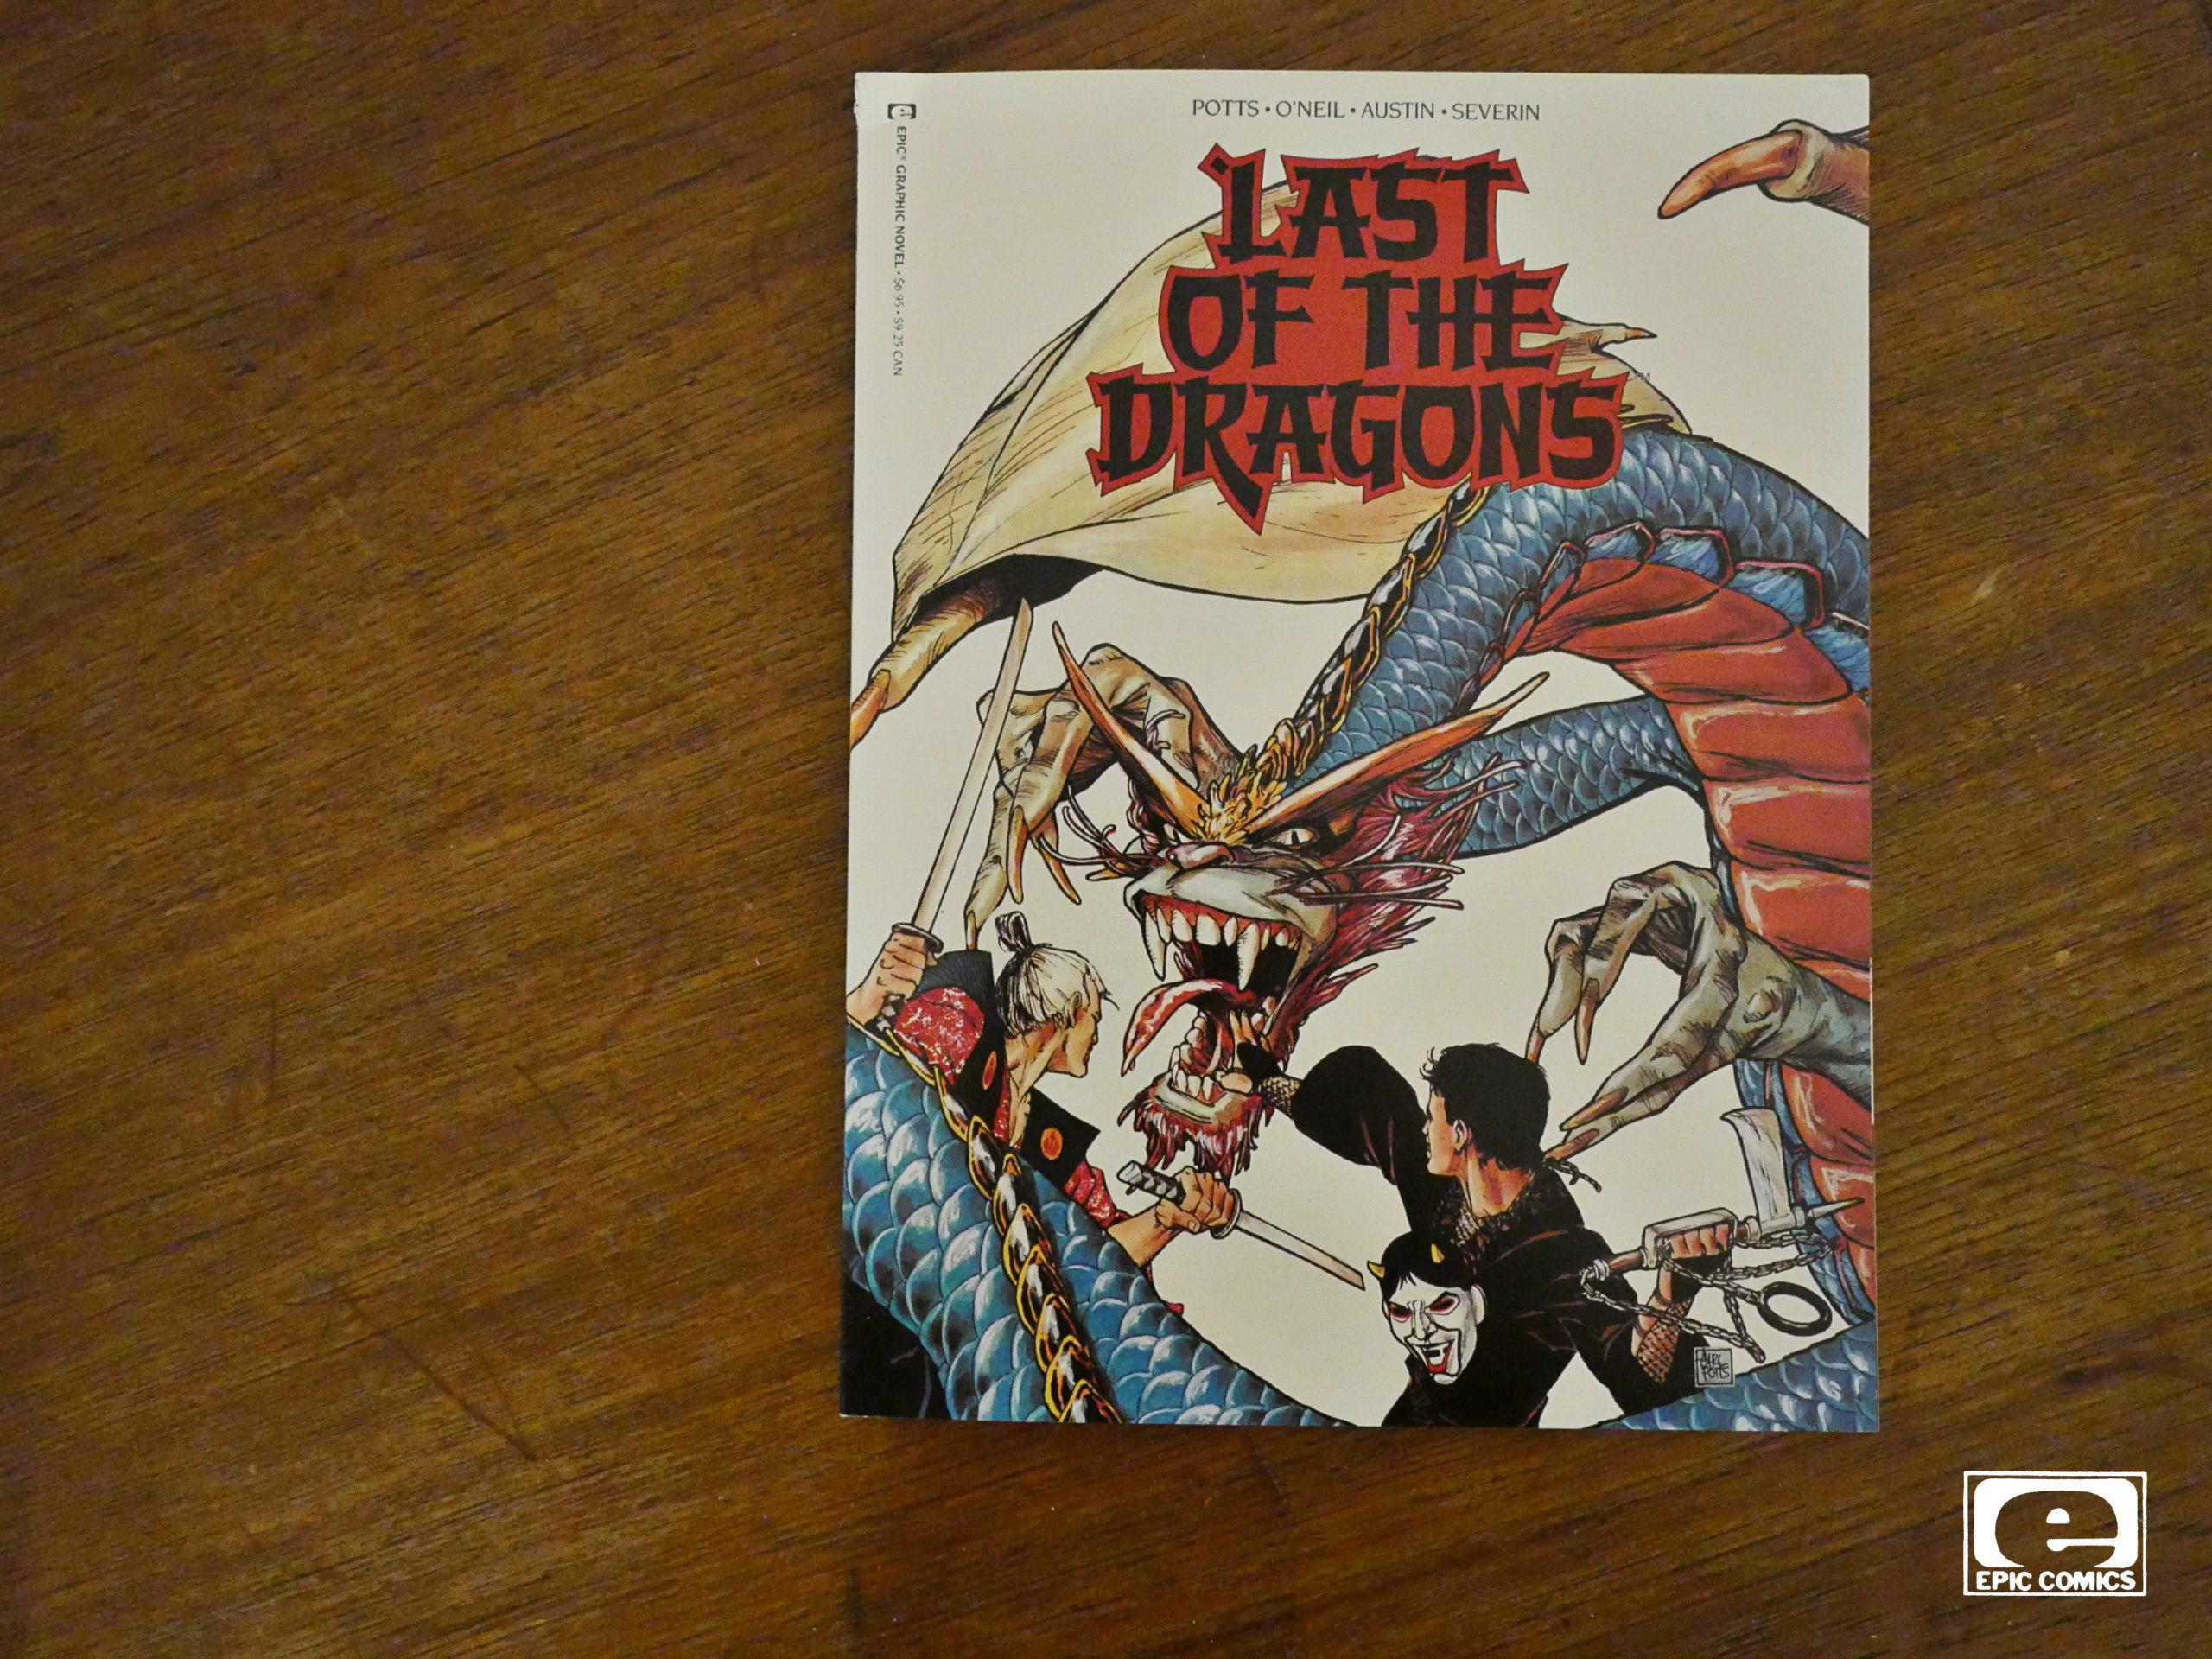 Carl Potts Last of the Dragons #1 1988 Epic Graphic Novel